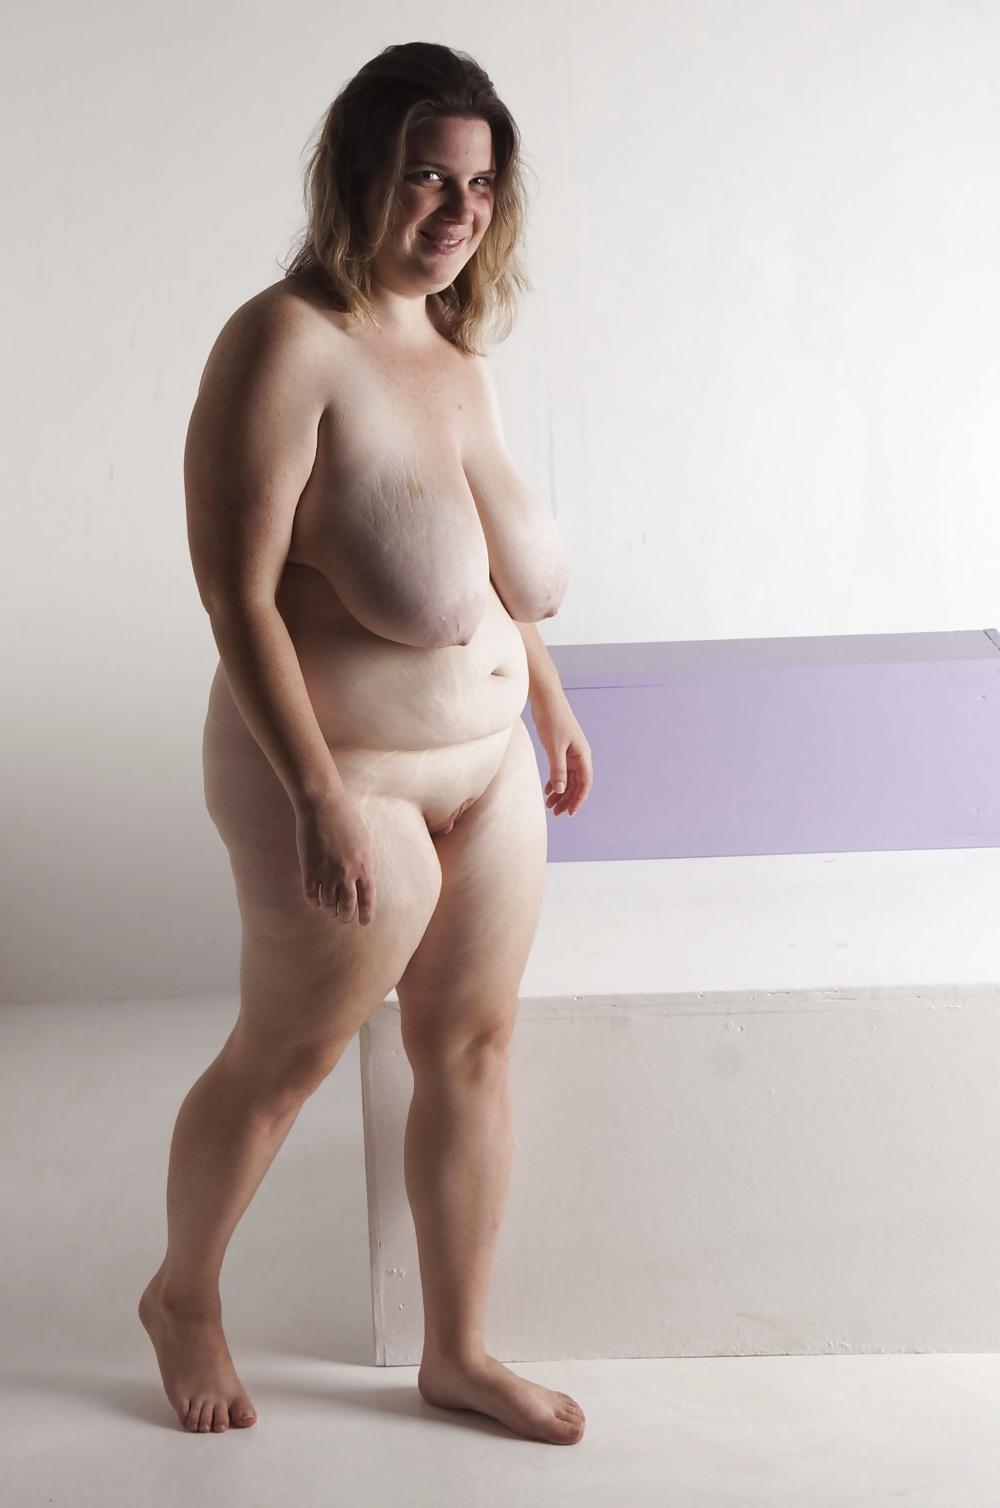 Ugly skinny naked women